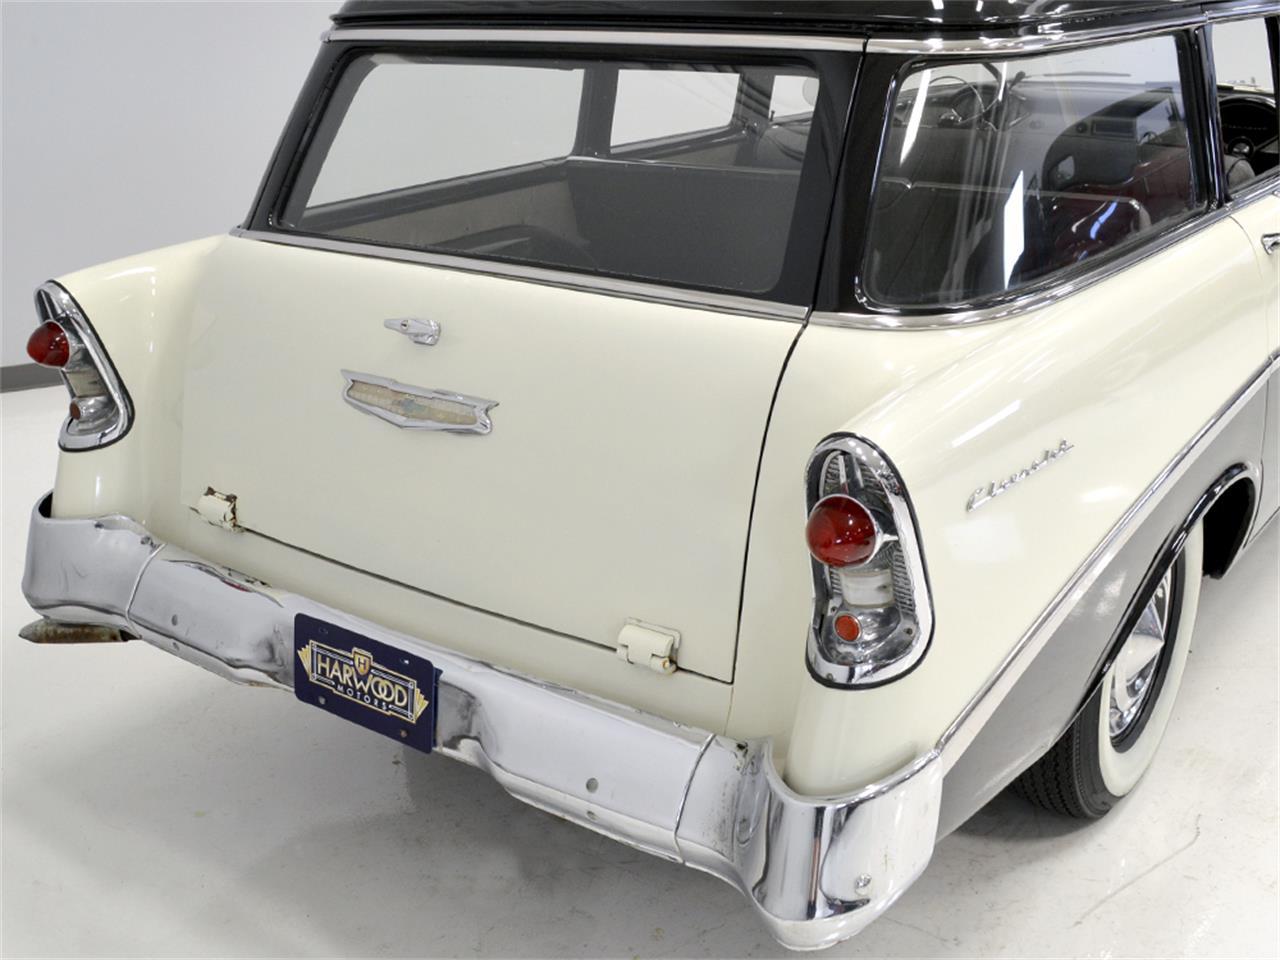 Large Picture of '56 210 - $24,900.00 Offered by Harwood Motors, LTD. - K2KS